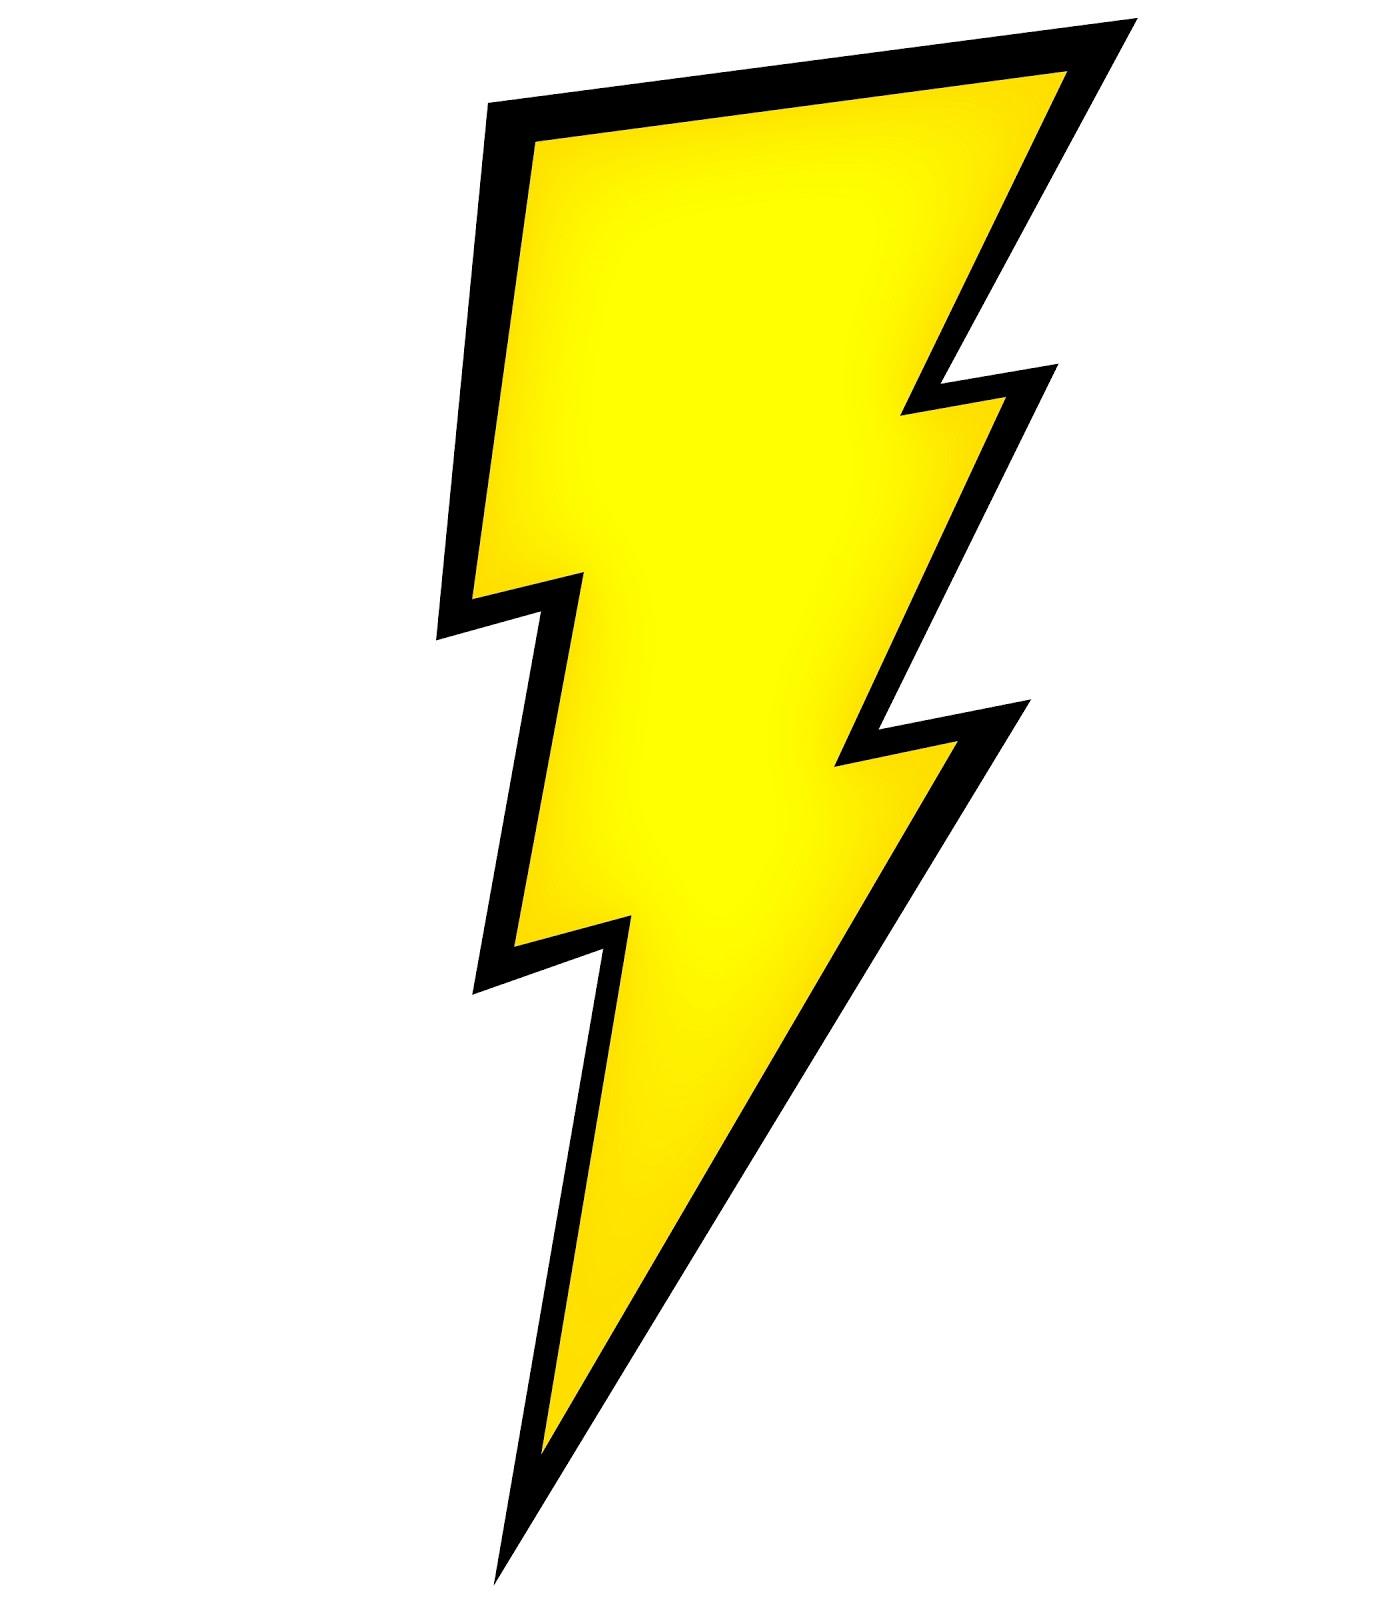 Lightning bolt images clipart